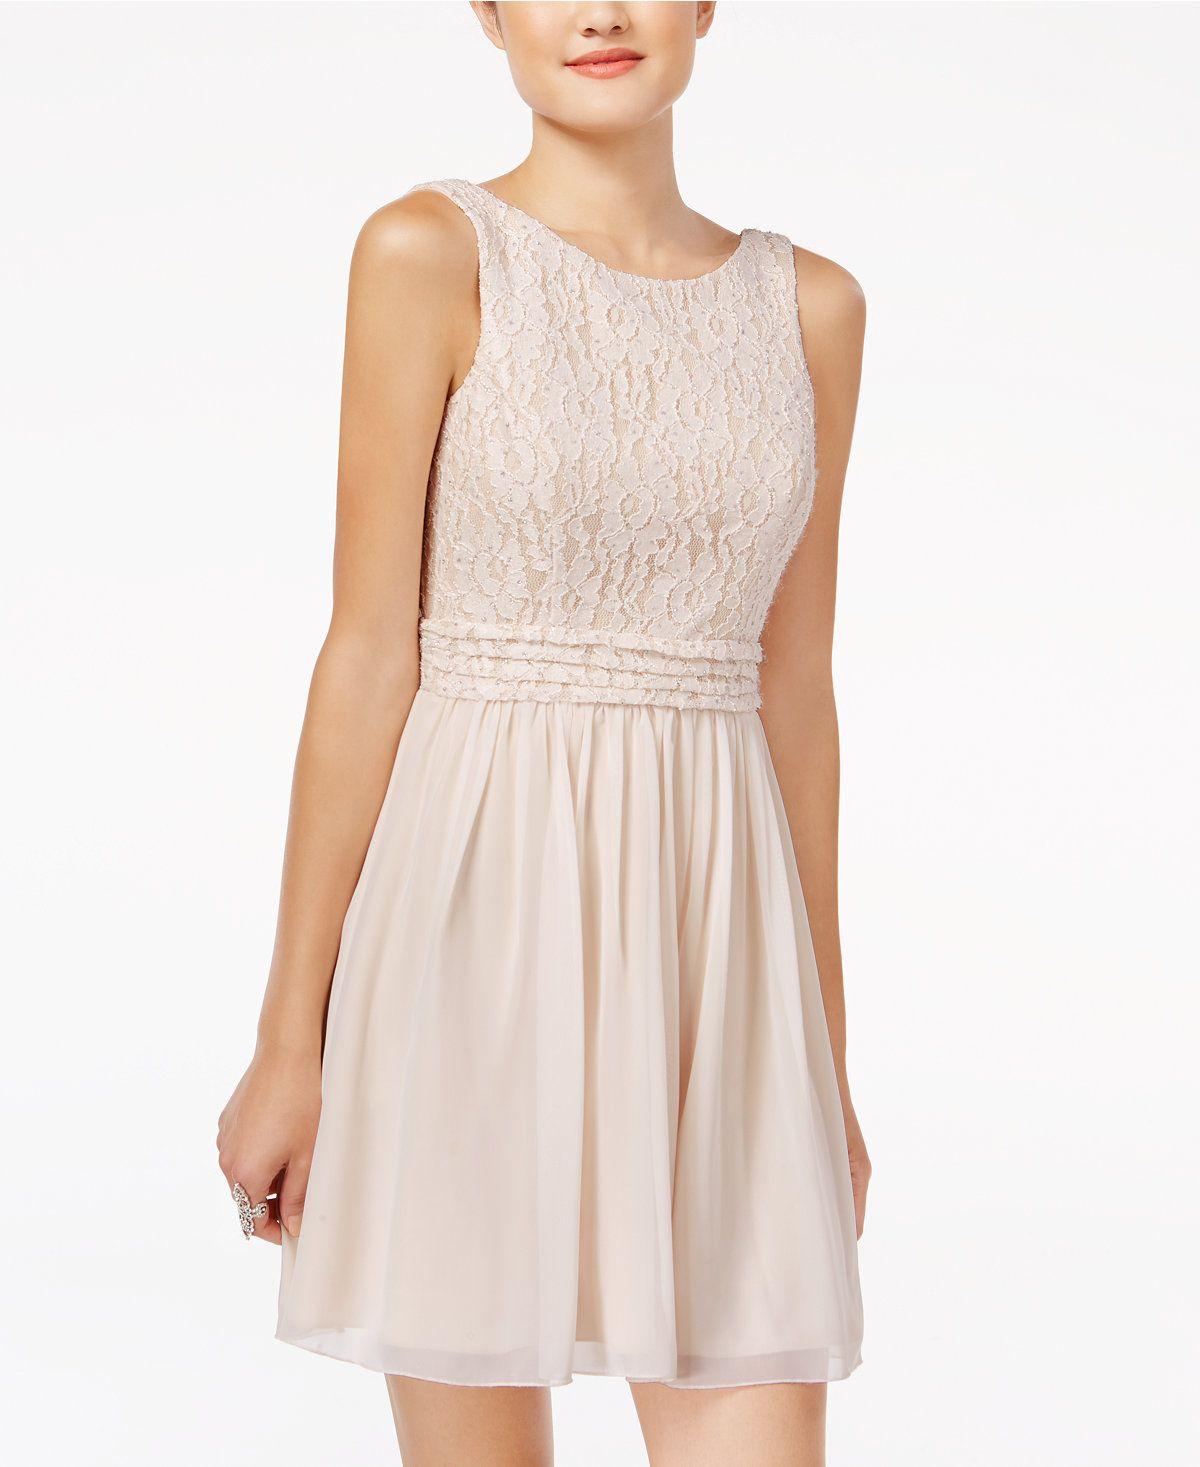 bbc0c238d83 Speechless Juniors  Glitter Lace Party Dress A Macy s Exclusive - Juniors  Dresses - Macy s